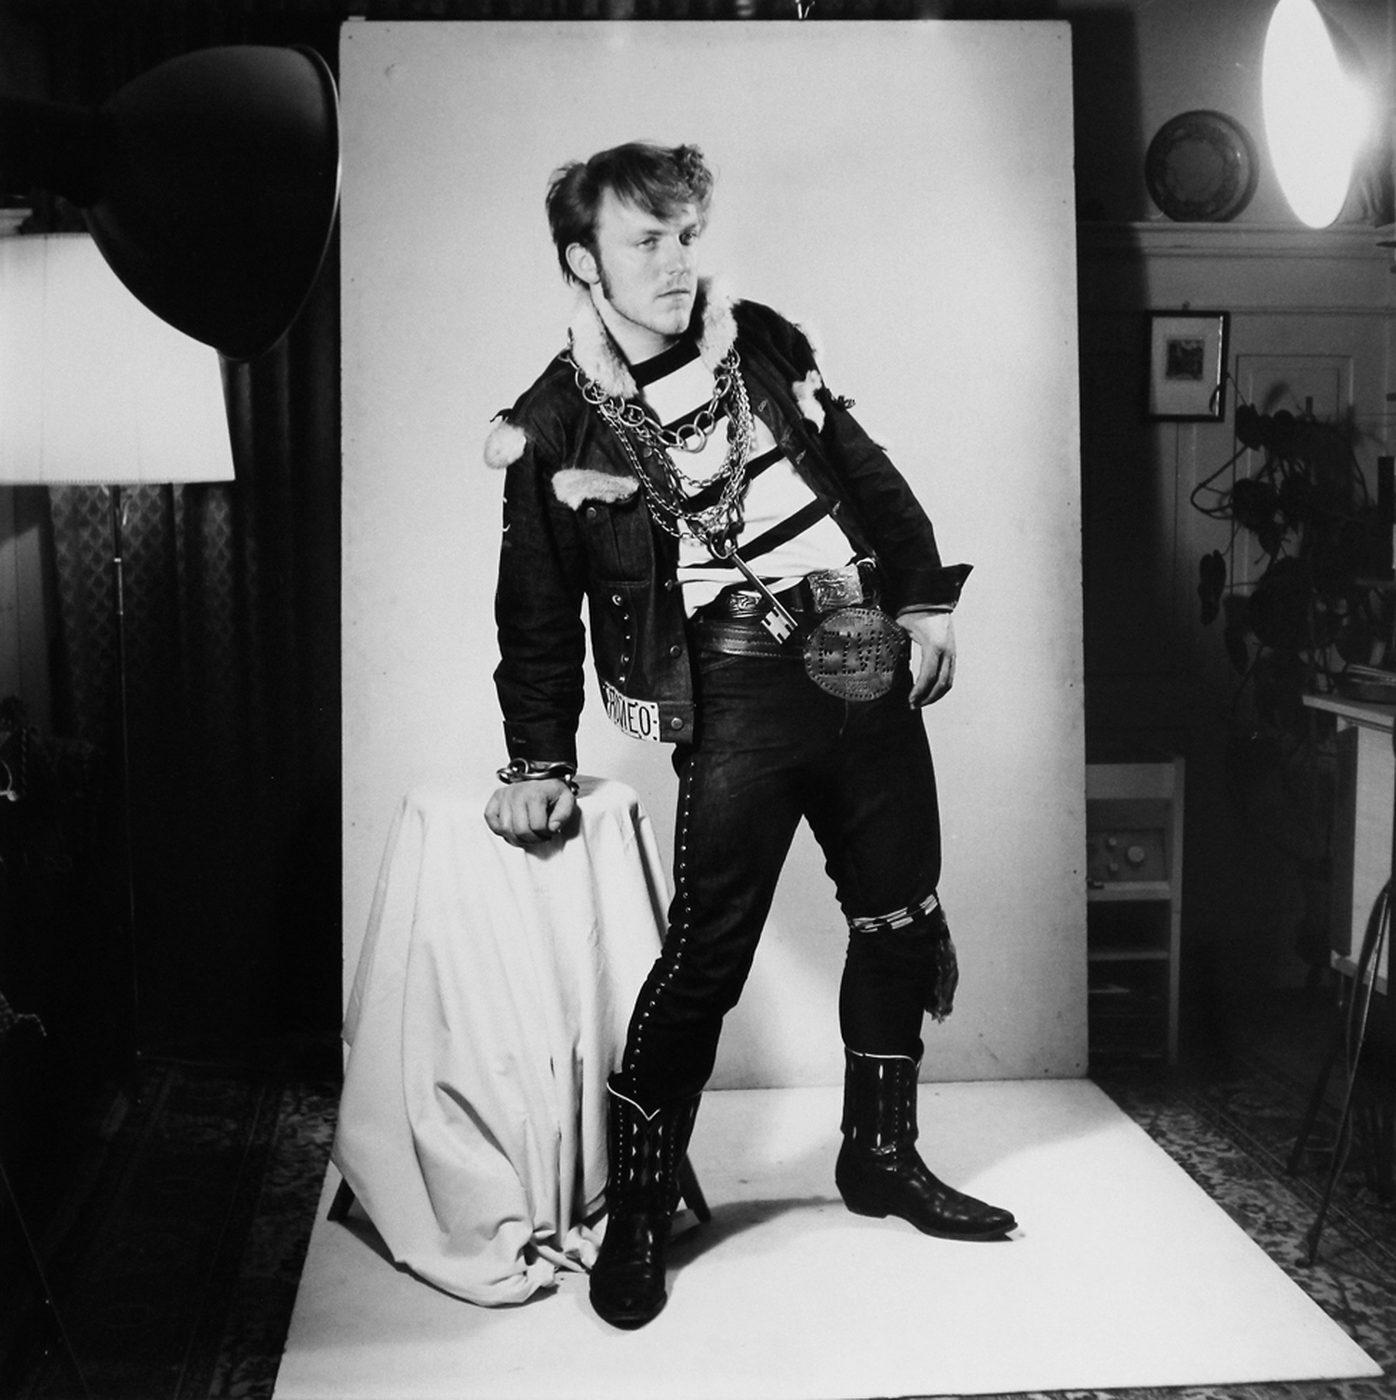 Karlheinz Weinberger - Romeo (Werner Berger) Boss Der Revenge Gang, Zurich, 1962